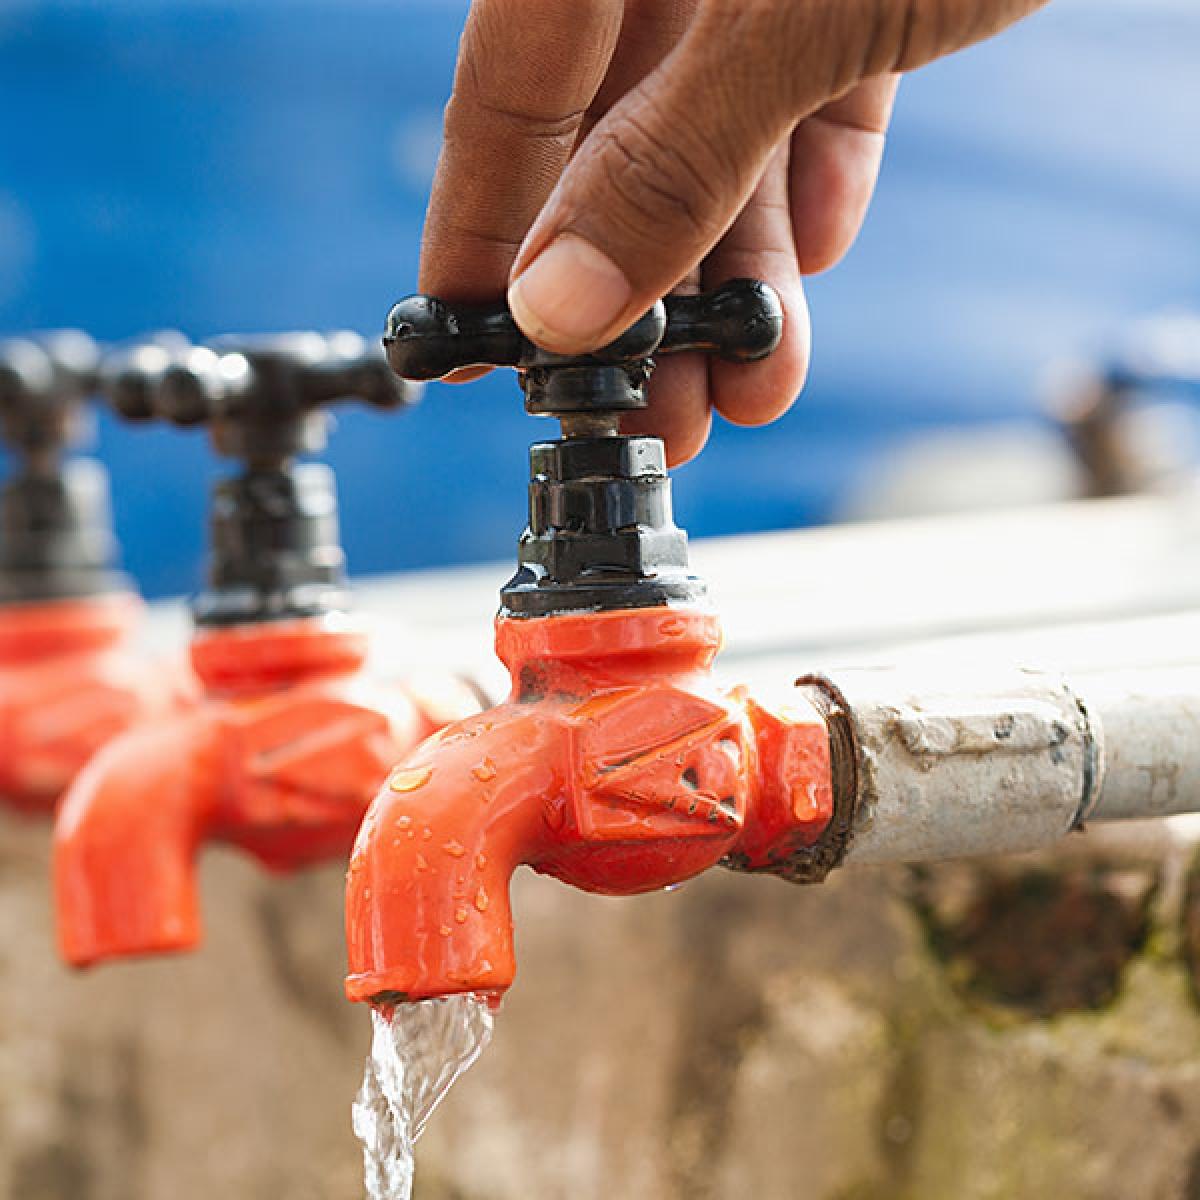 Besides coronavirus threat, Bhopal now faces water shortage